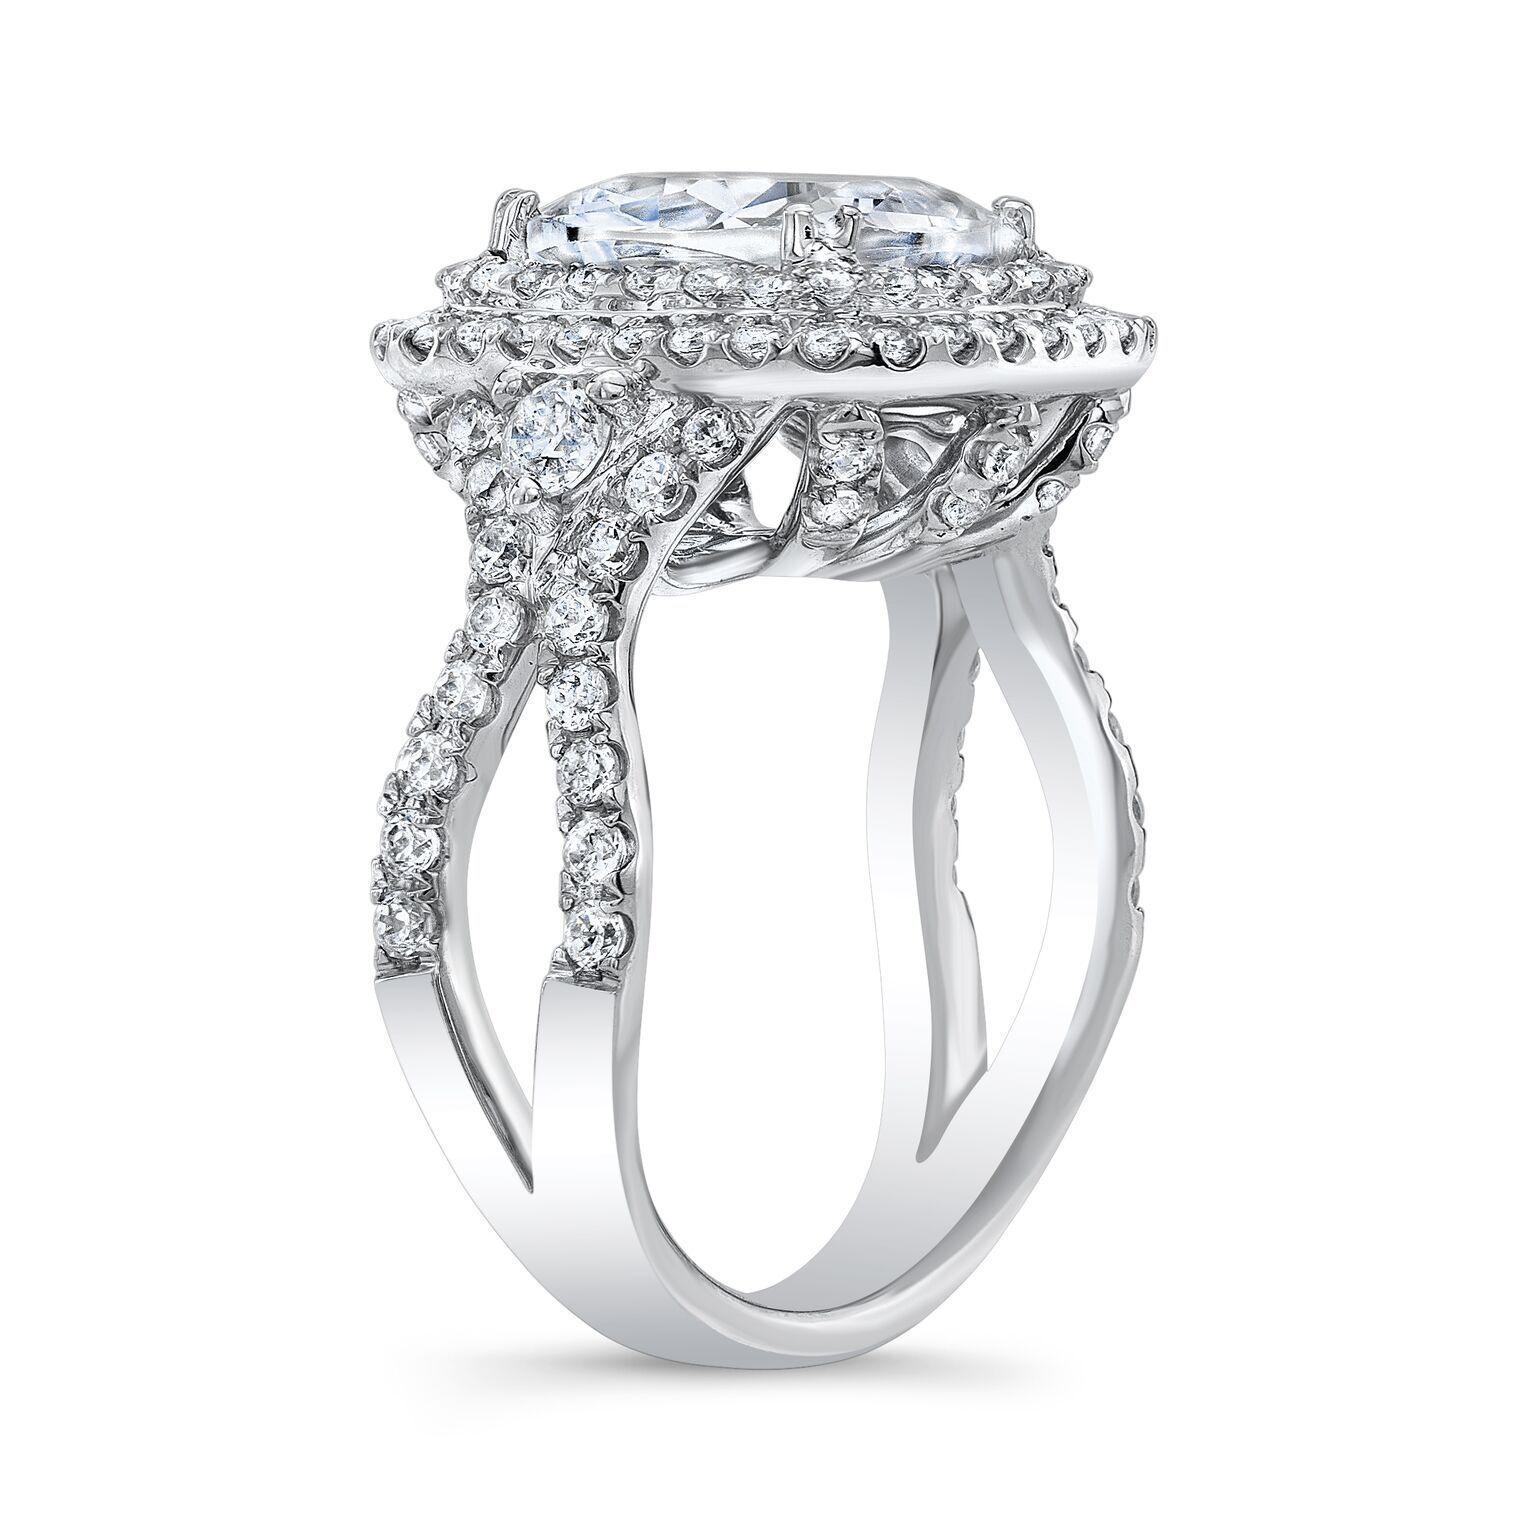 2.40ctNatural Cushion Cut Double Halo Split Shank with side diamonds profile GIA 2